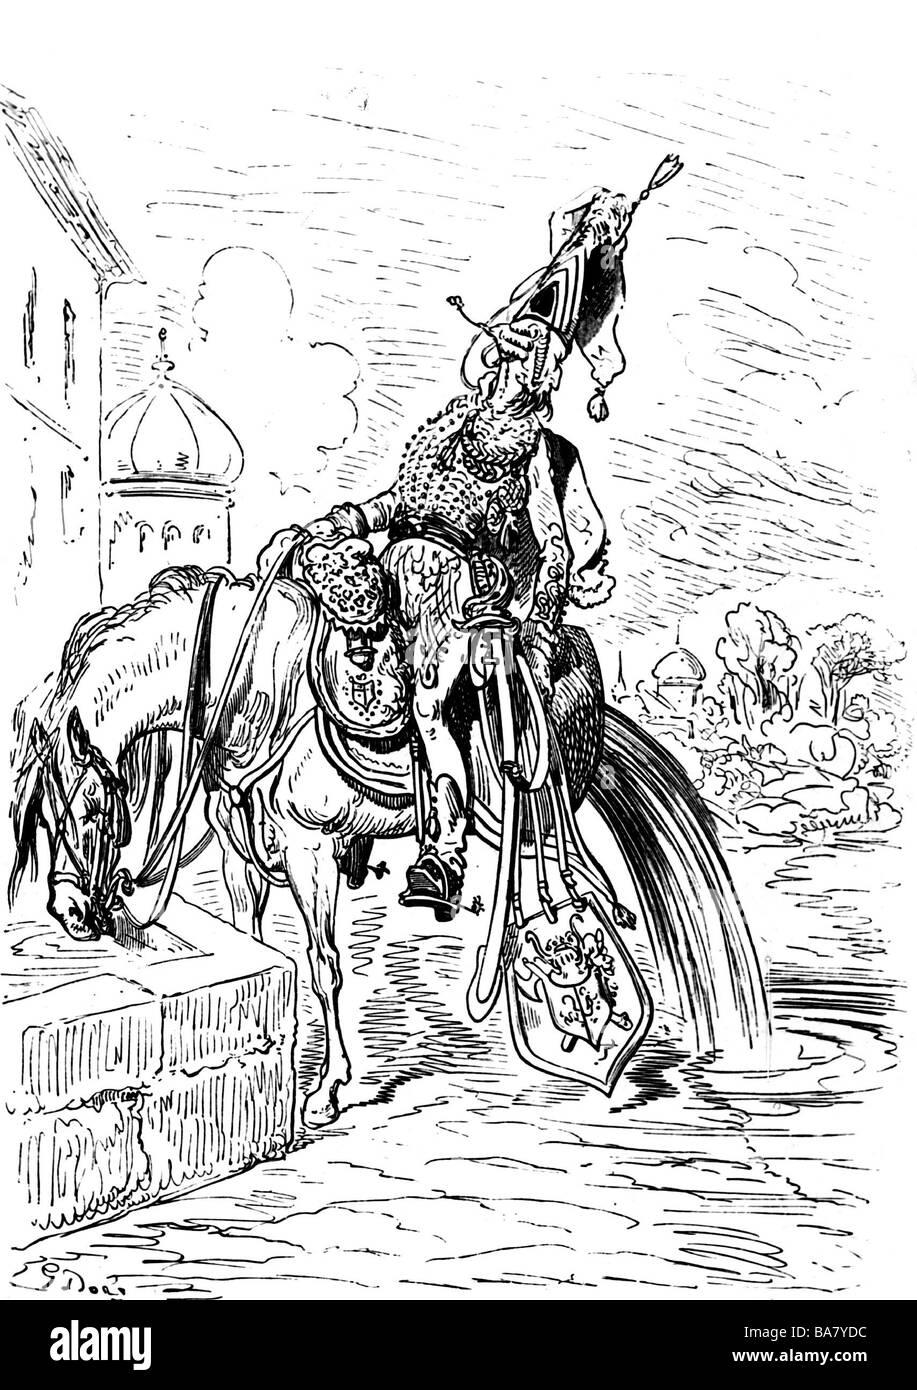 Münchhausen, Barón Karl Friedrich Hieronymus, Freiherr von, 11.5.1720 - 22.2.1797, escena de sus aventuras: Agua corriendo de medio caballo, grabado en madera siglo 19, Munchhausen, Muenchhausen, , Foto de stock